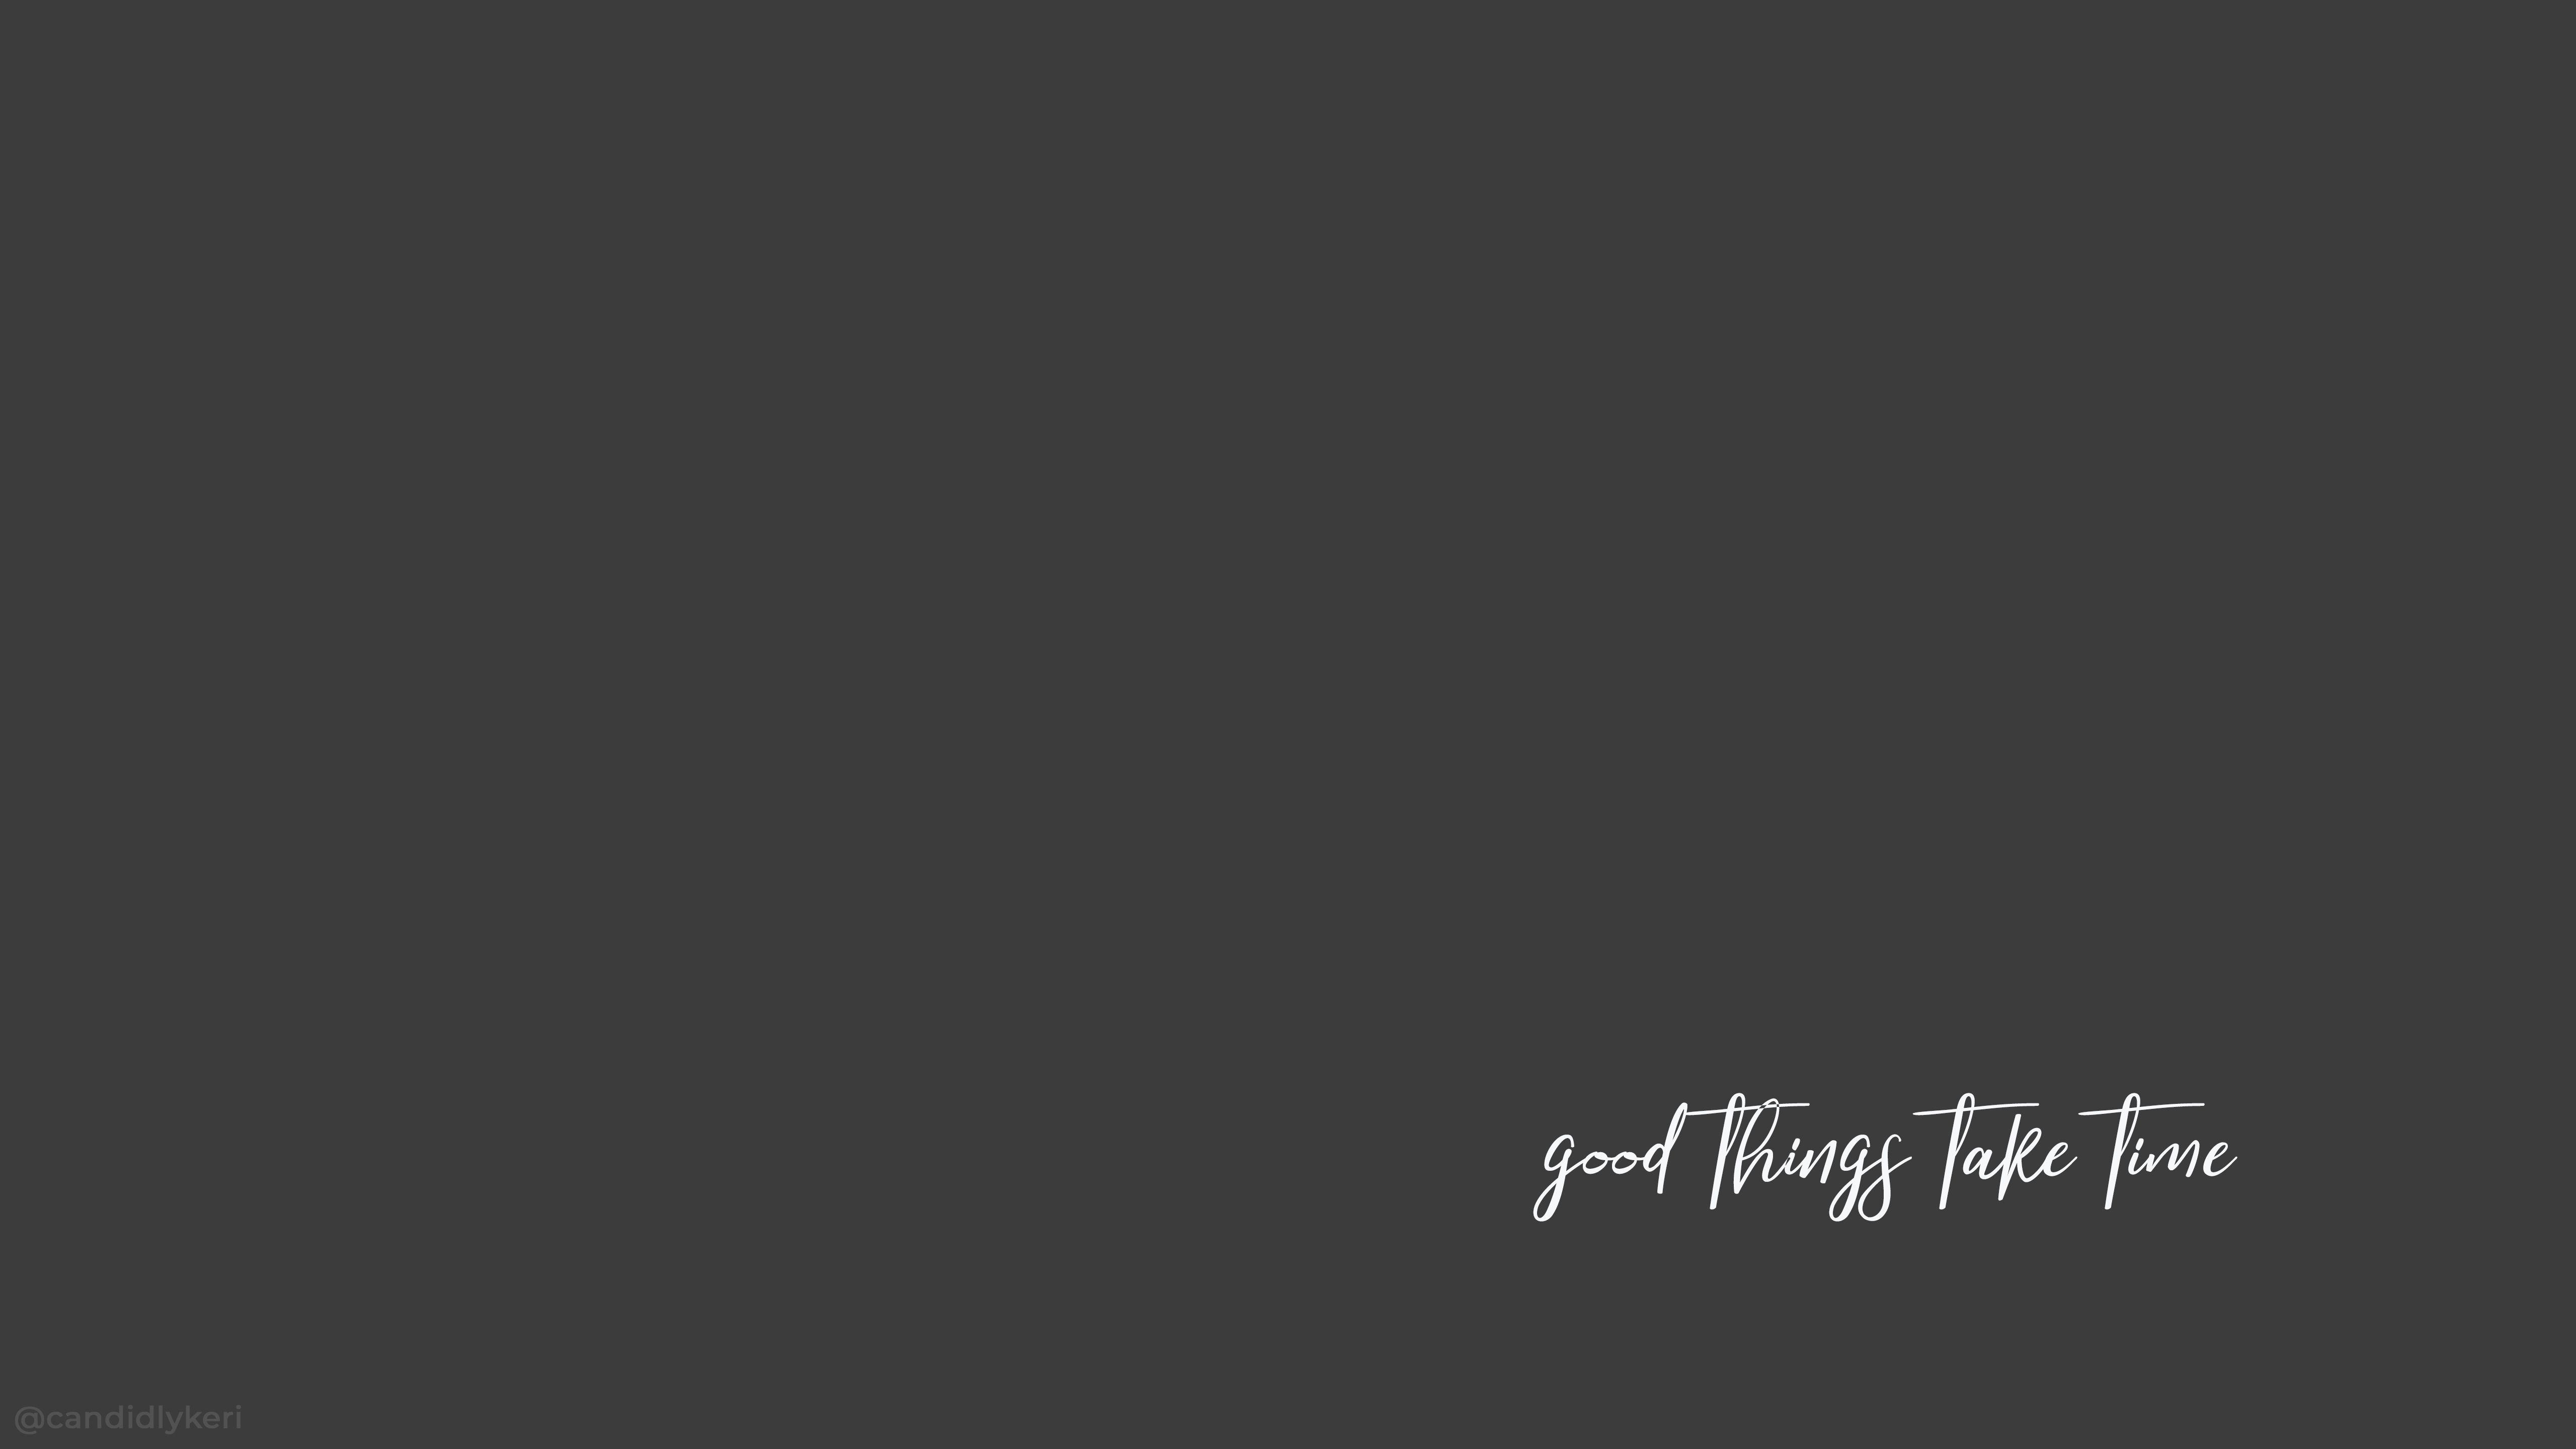 Photography Aesthetic Tumblr Wallpaper Desktop in 2020